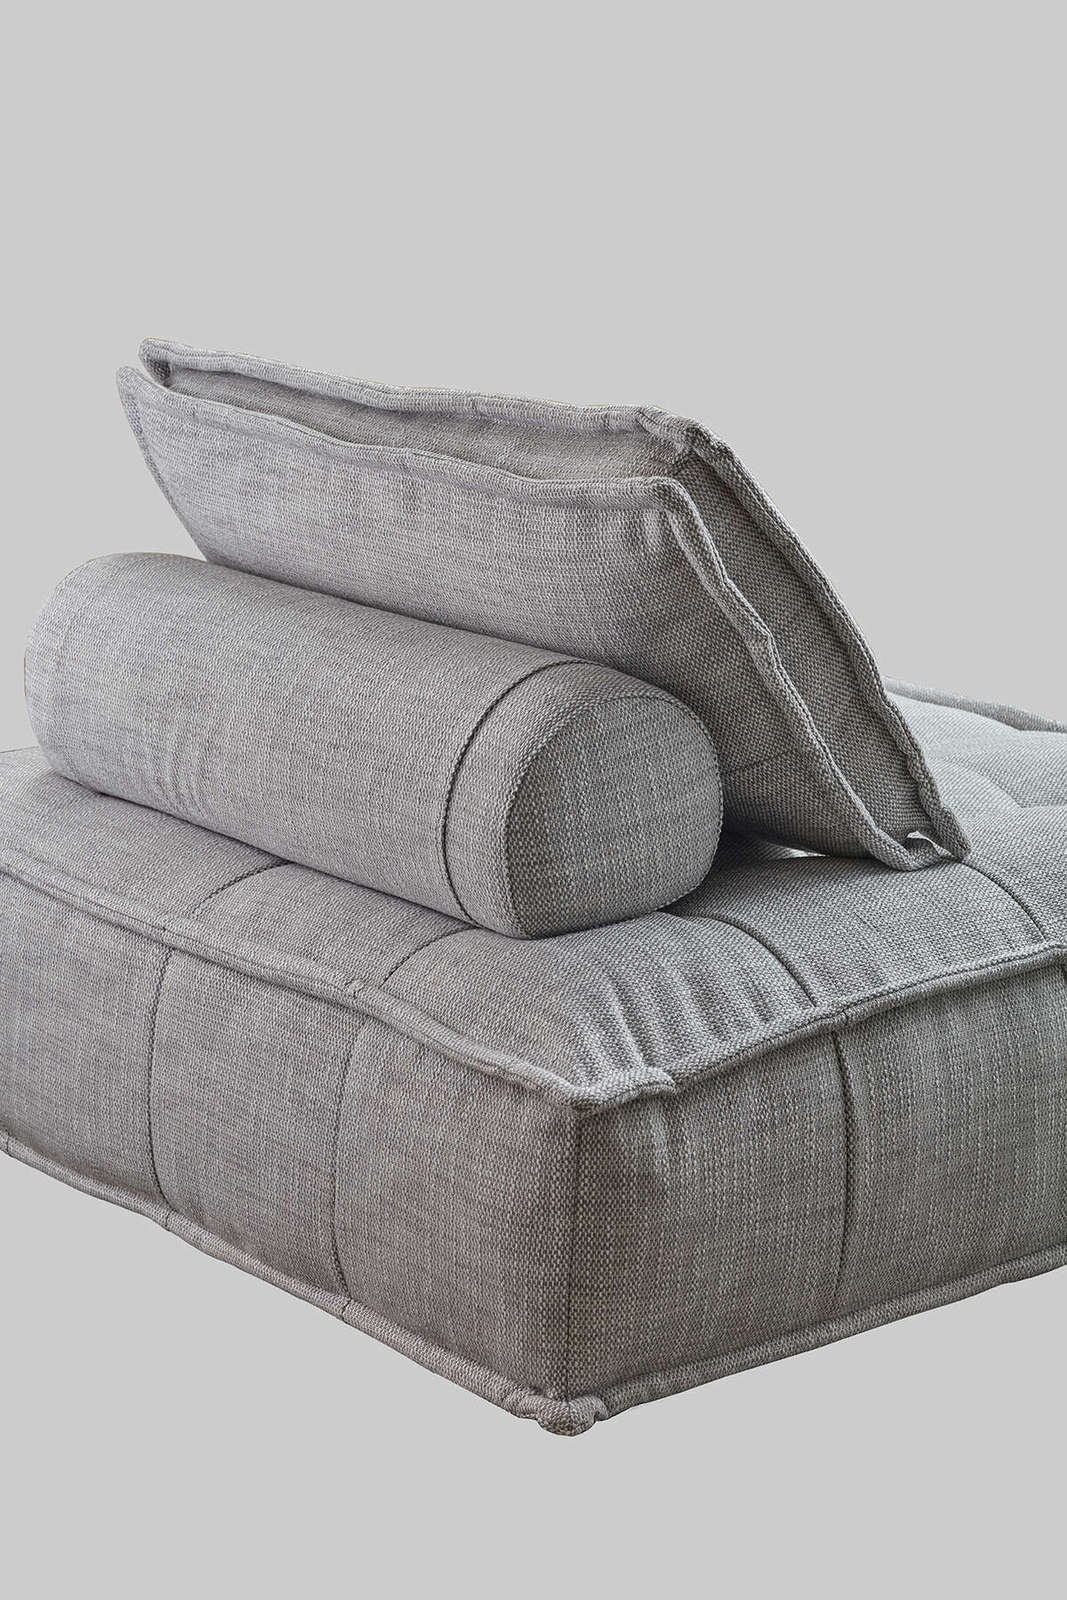 Casper Armchair Grey 3